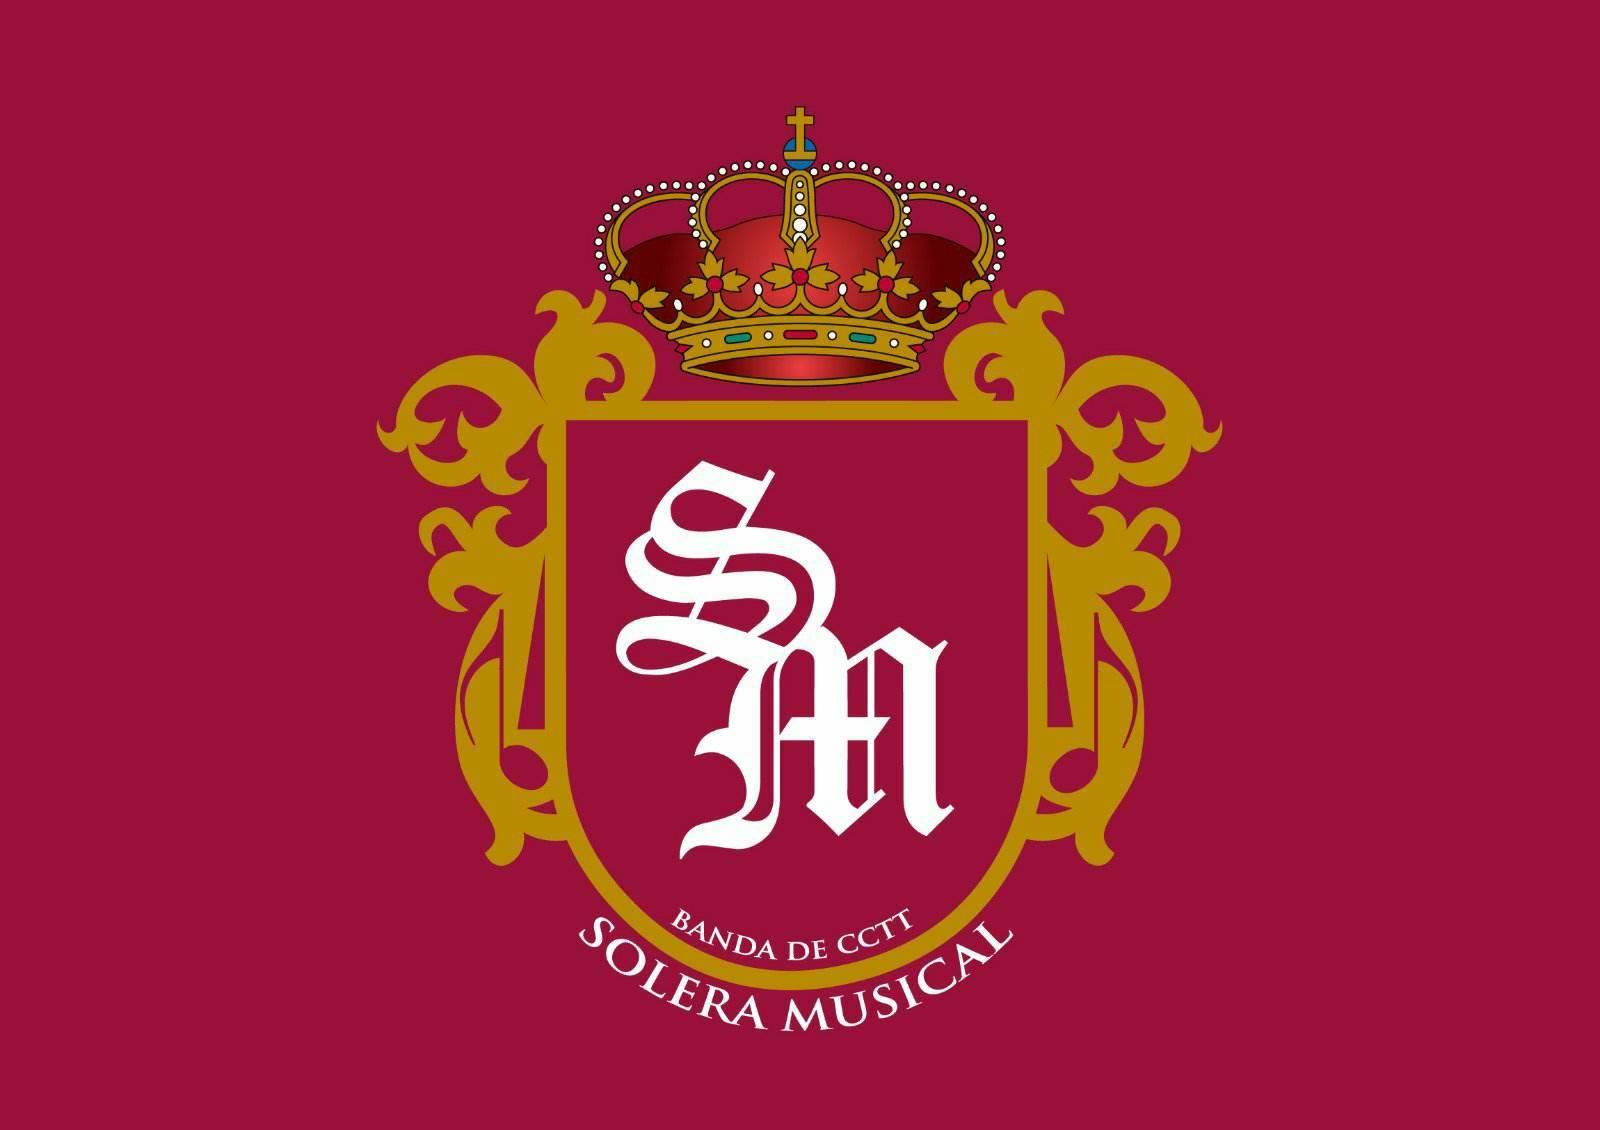 escudo solera musical